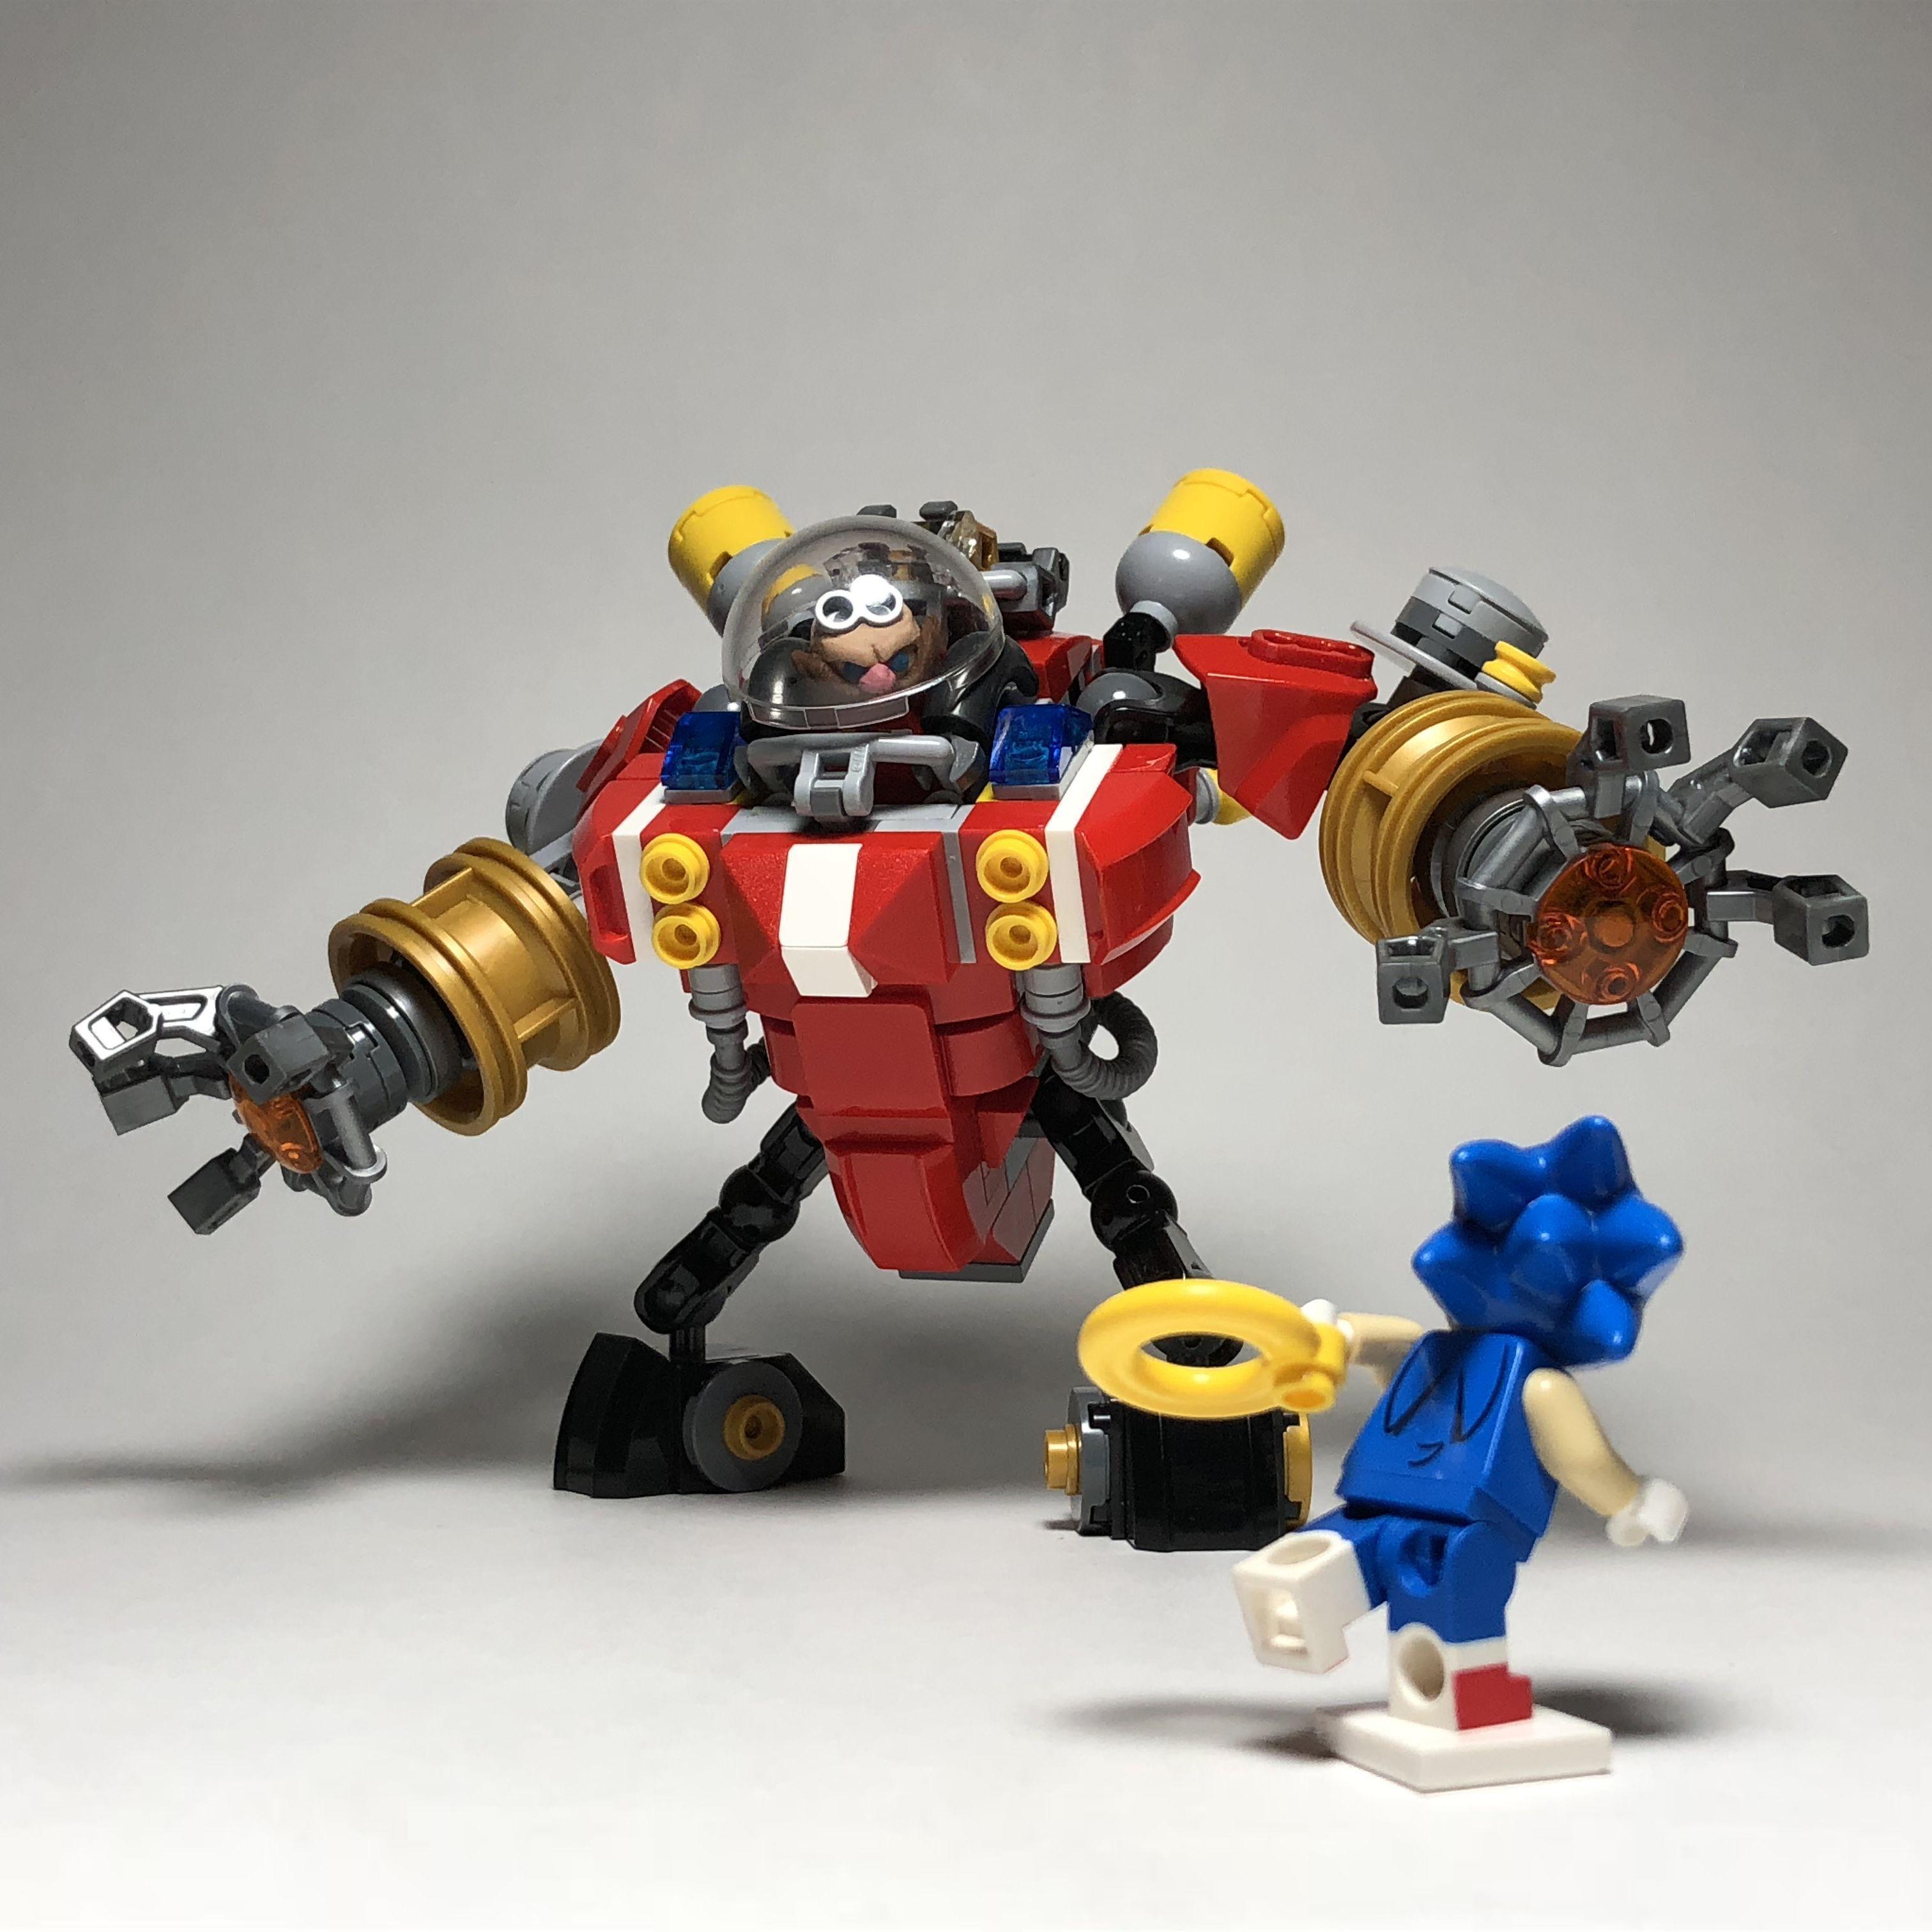 Lego Ideas Sonic The Hedgehog Gegen Dr Eggman Lego Ideas Sonic The Hedgehog Gegen Dr Eggman Das Schonste Bild Fur In 2020 Lego Design Cool Lego Creations Lego Robot